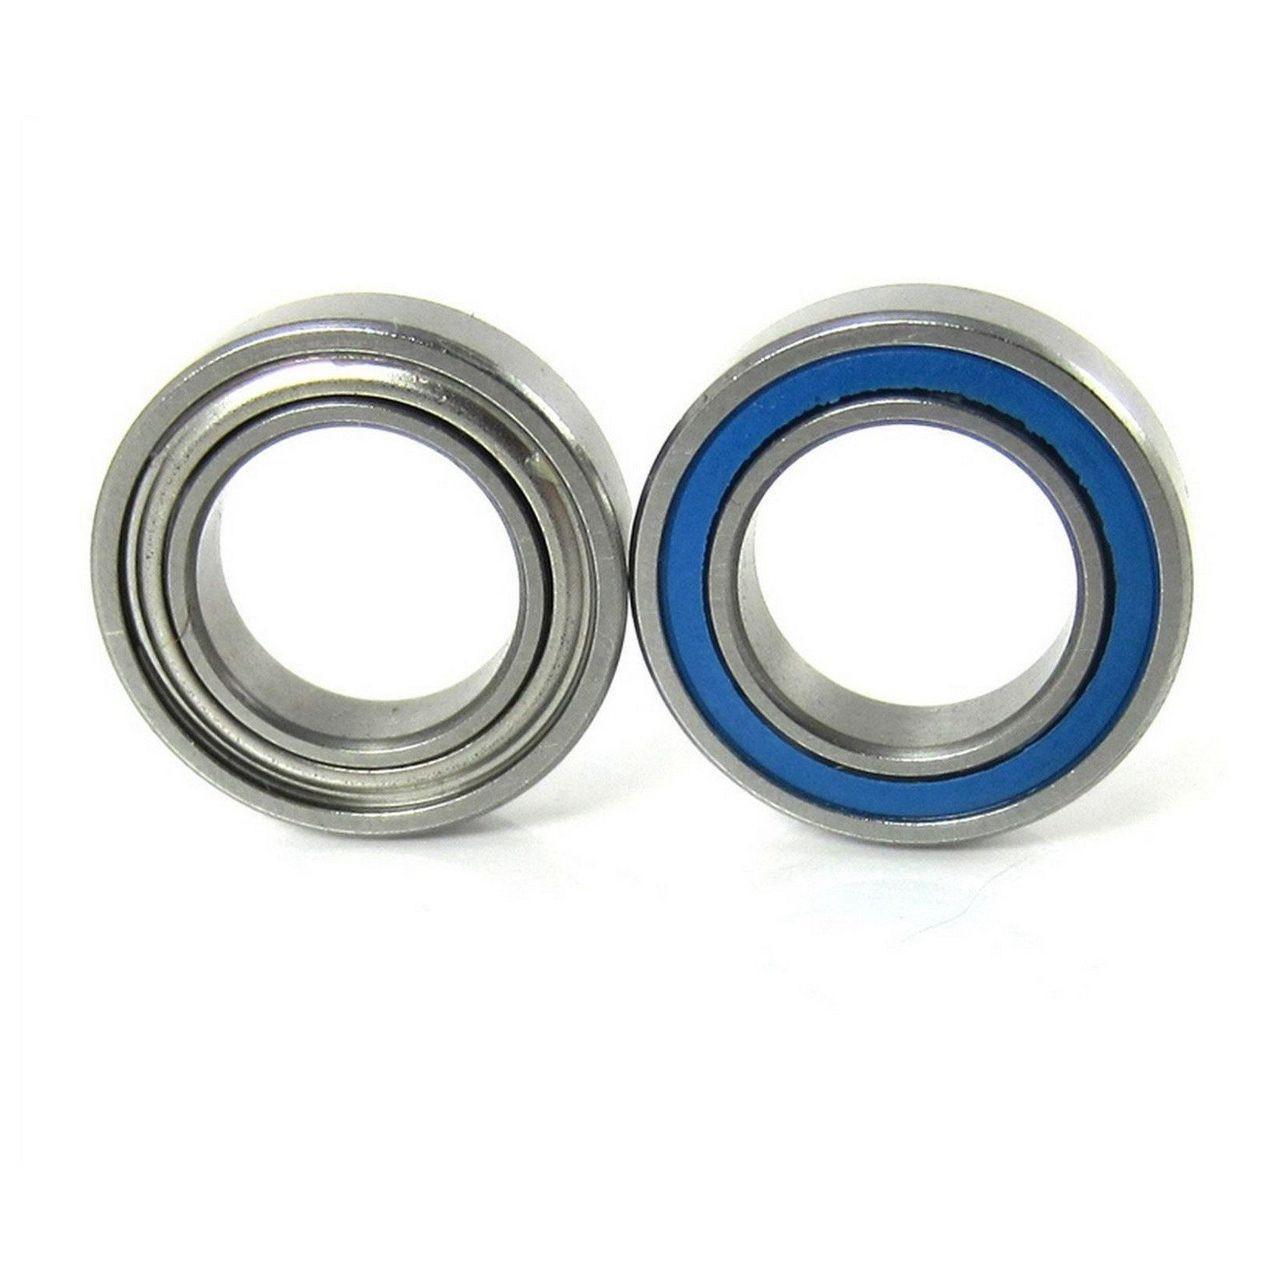 TRB RC 3/8x5/8x5/32 Precision Ceramic Ball Bearings Hybrid Seals (2)